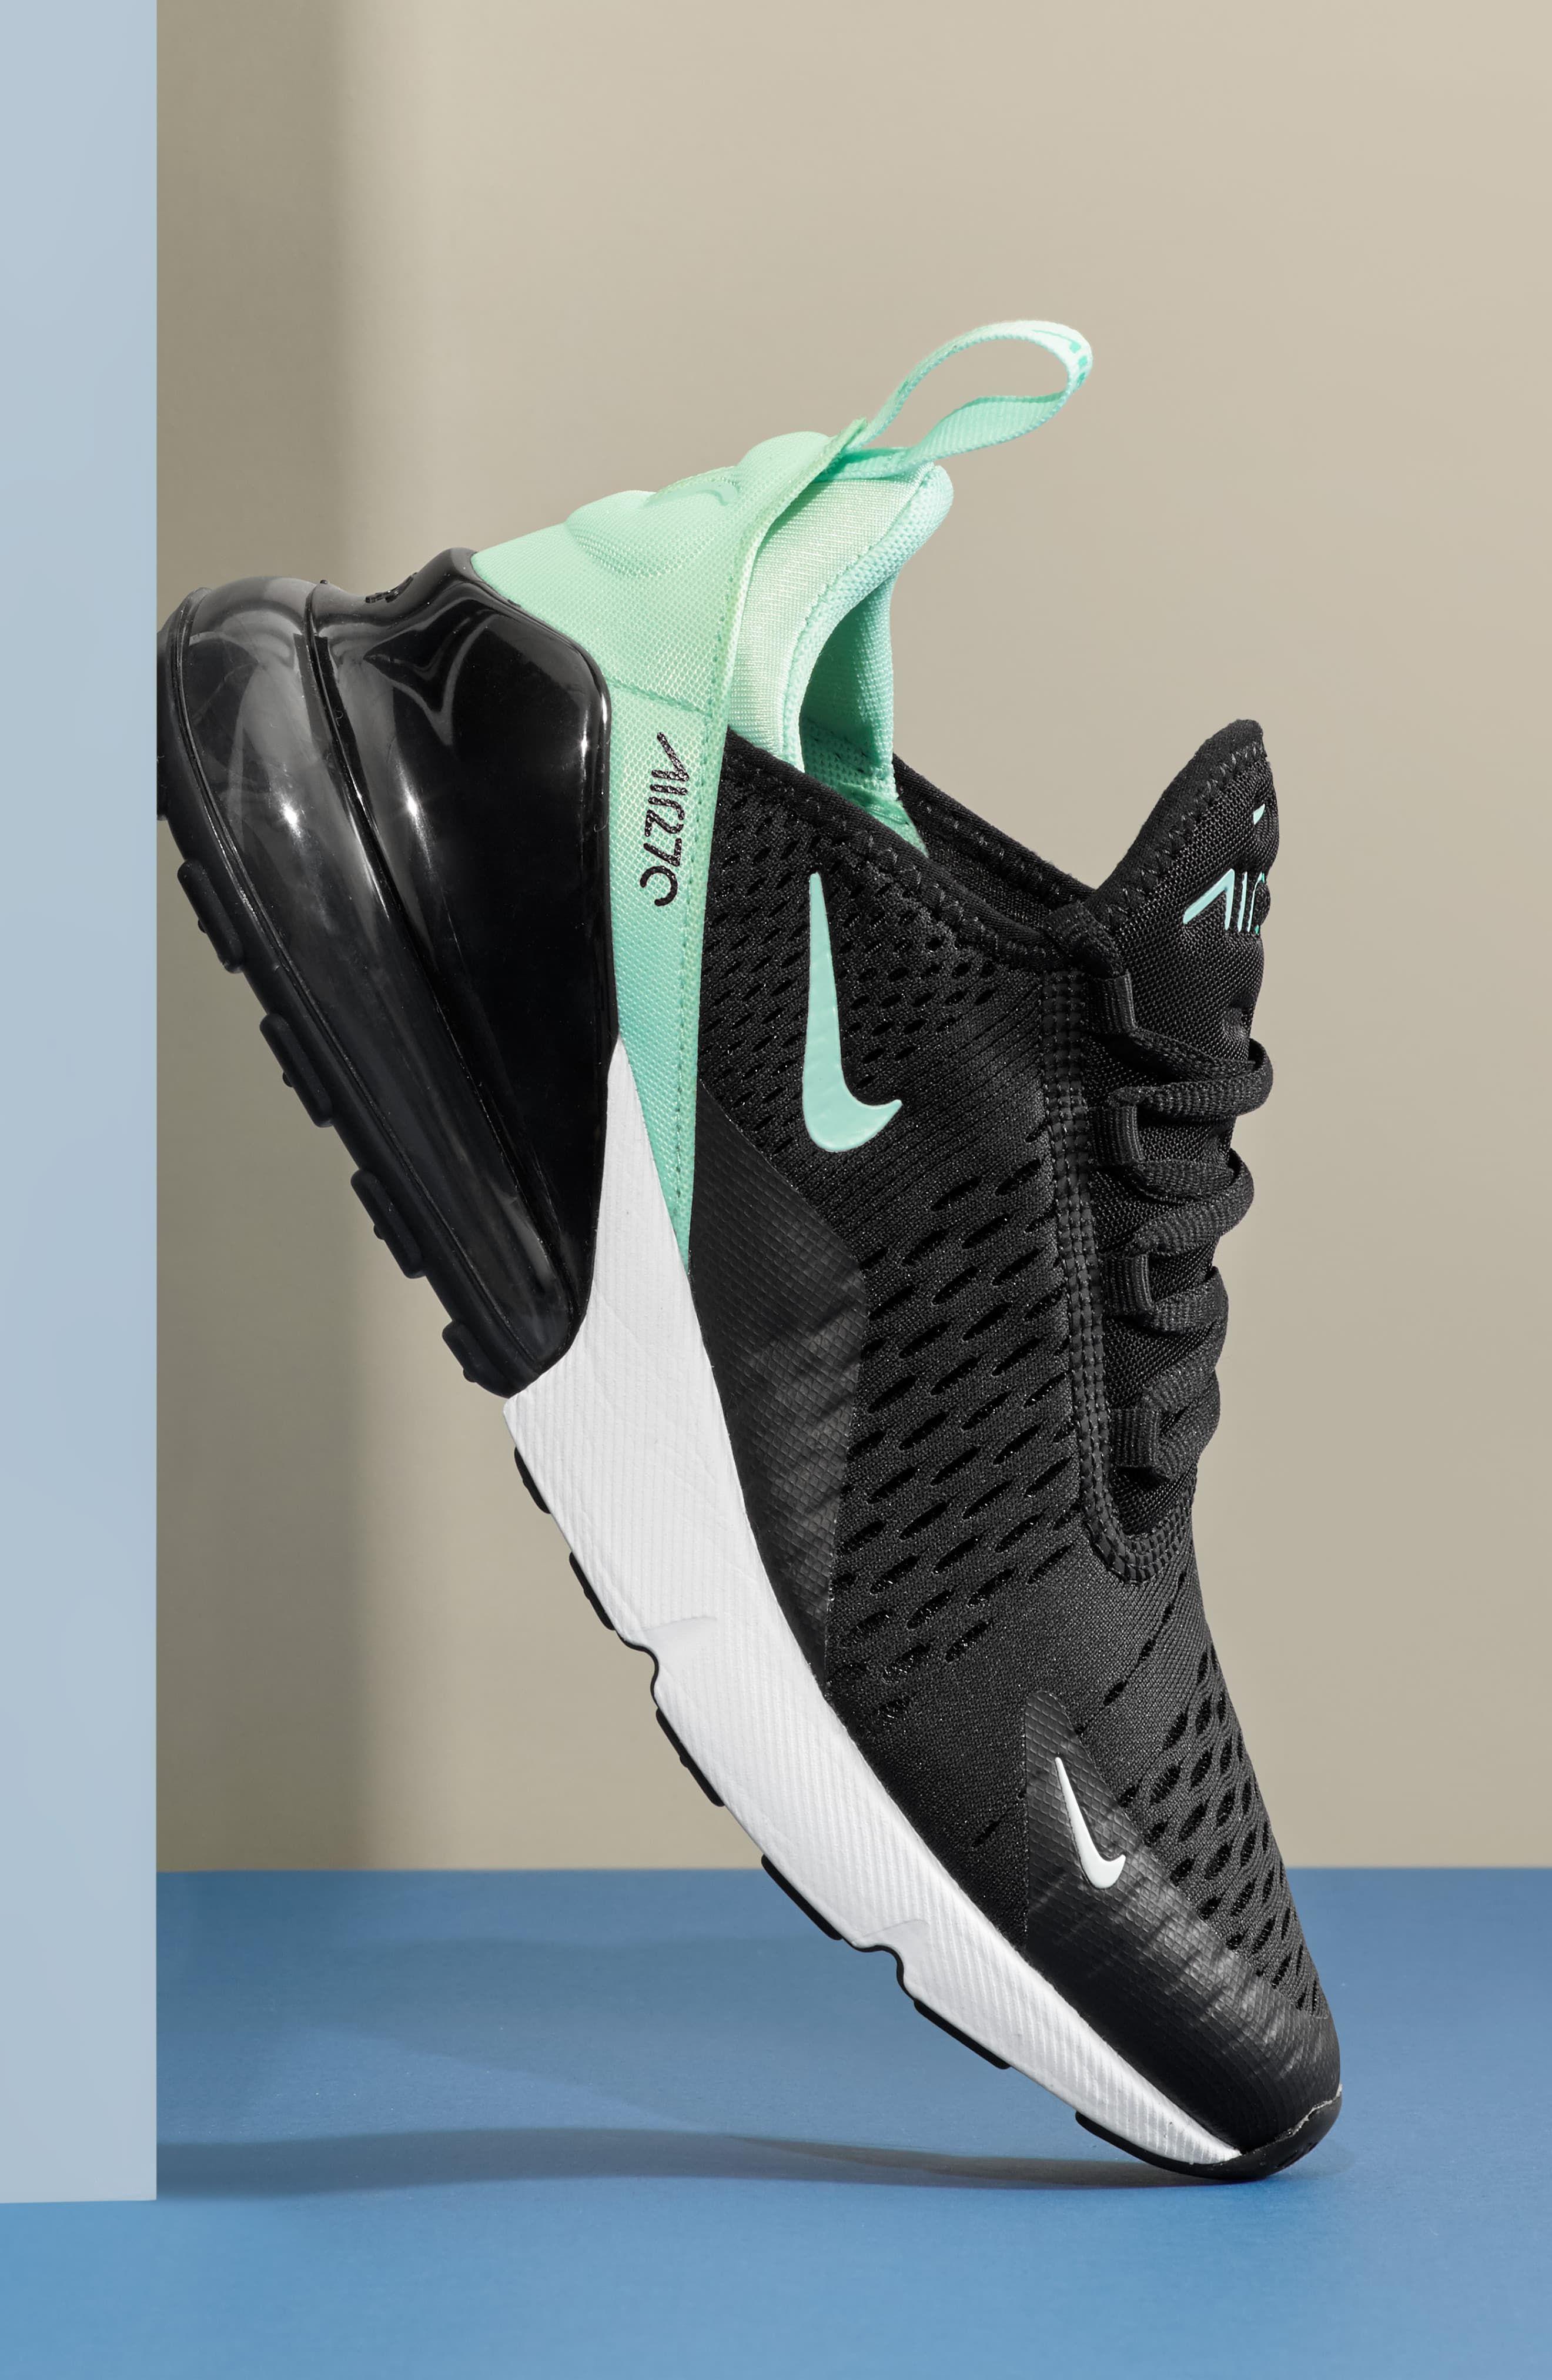 Nike Air Max 270 Premium Sneaker Sz 9 Black White